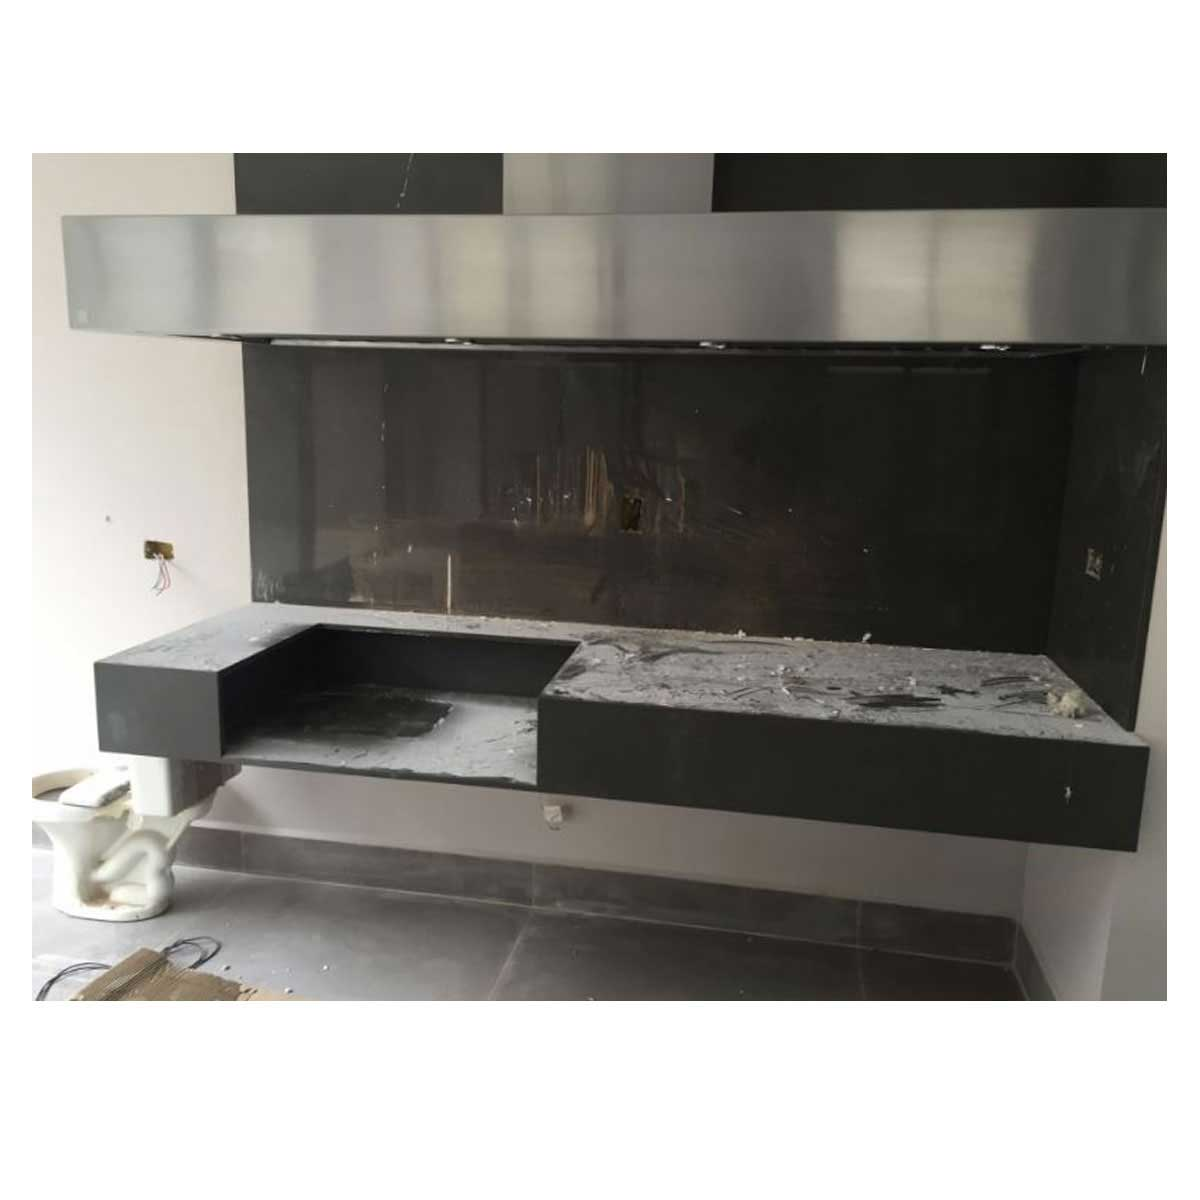 Churrasqueira a Gas Home e Grill Compact Premium HG-2B - 2 Queimadores - 100% Inox 304  - Sua Casa Gourmet e Cia